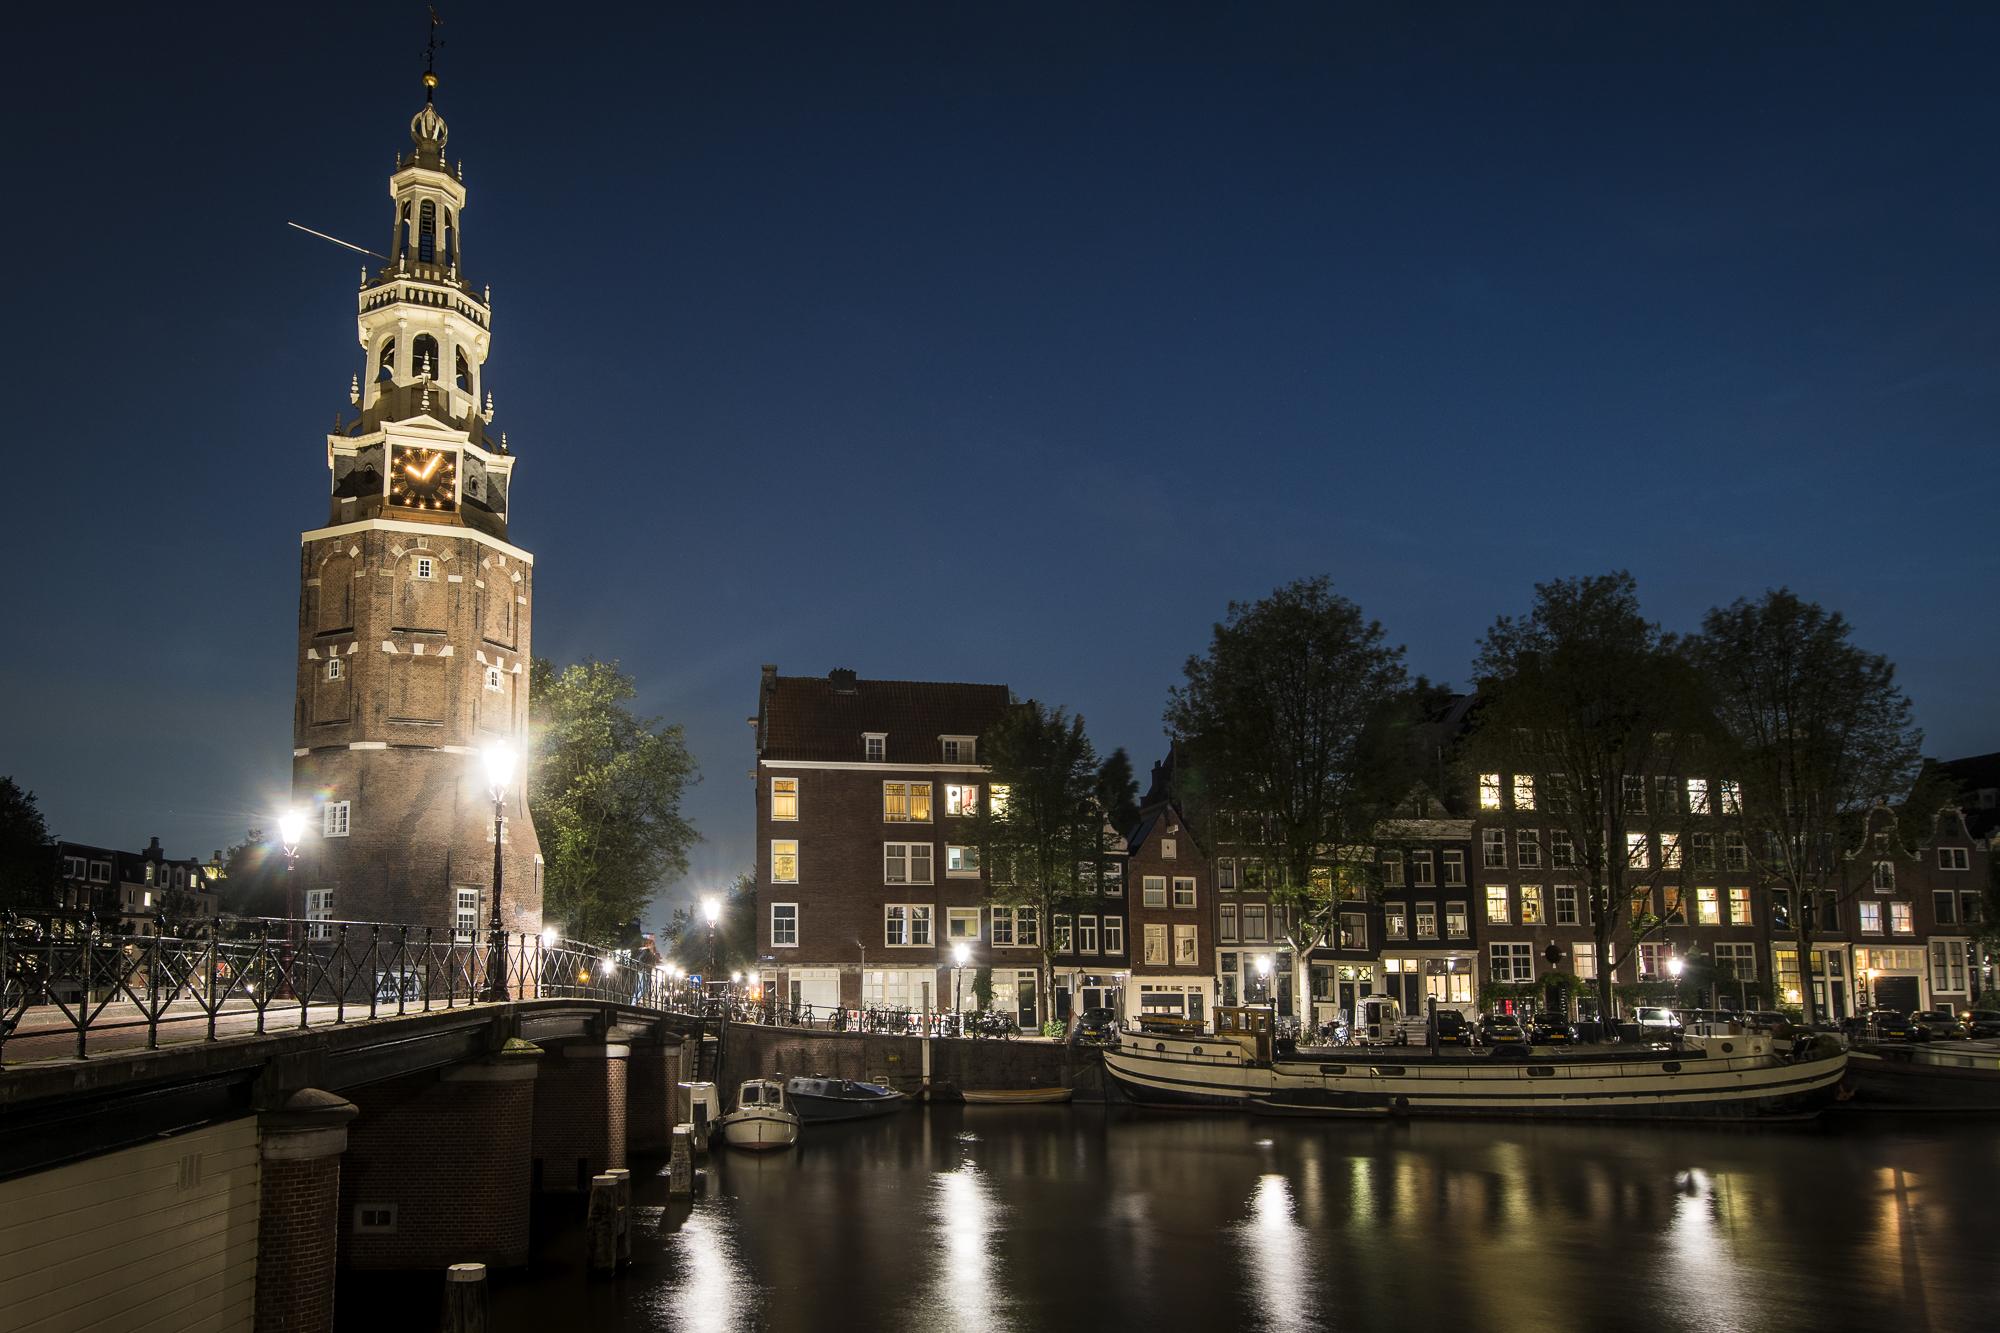 amsterdam-photo-tour-007.jpg